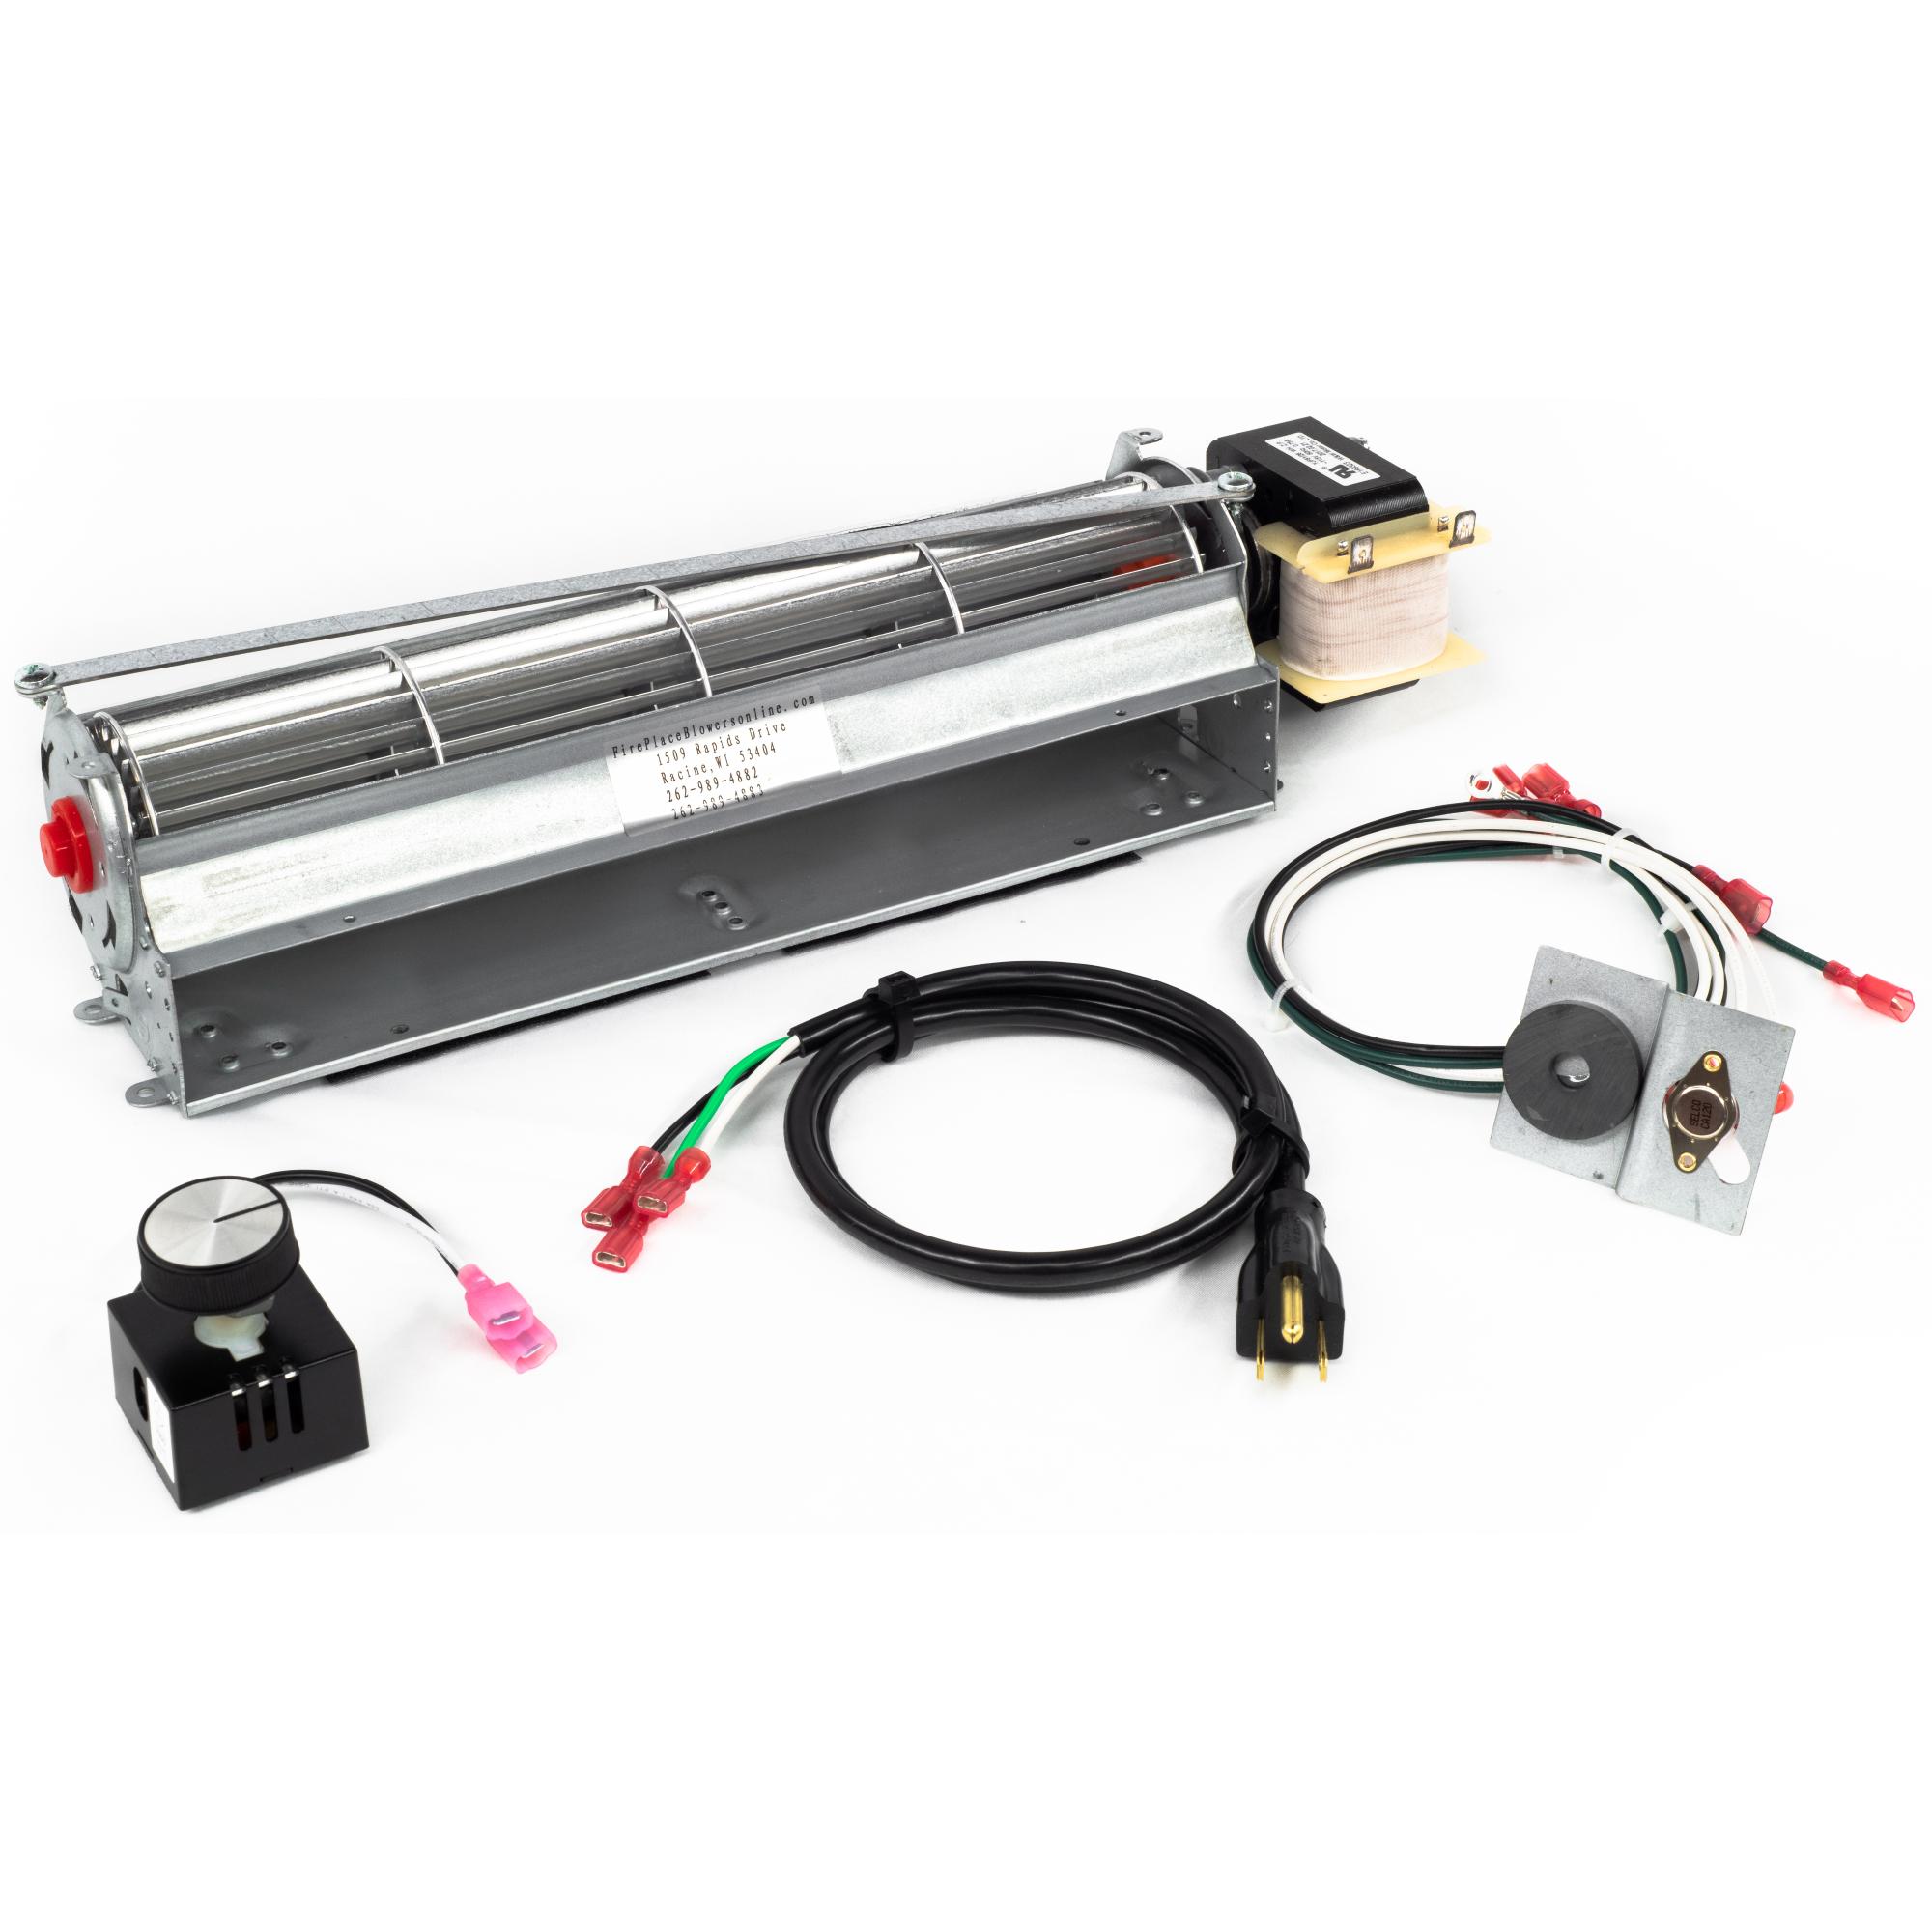 GA3650T(B) Fireplace Blower Kit for Comfort Glow, Desa, FMI & Vanguard Fireplaces